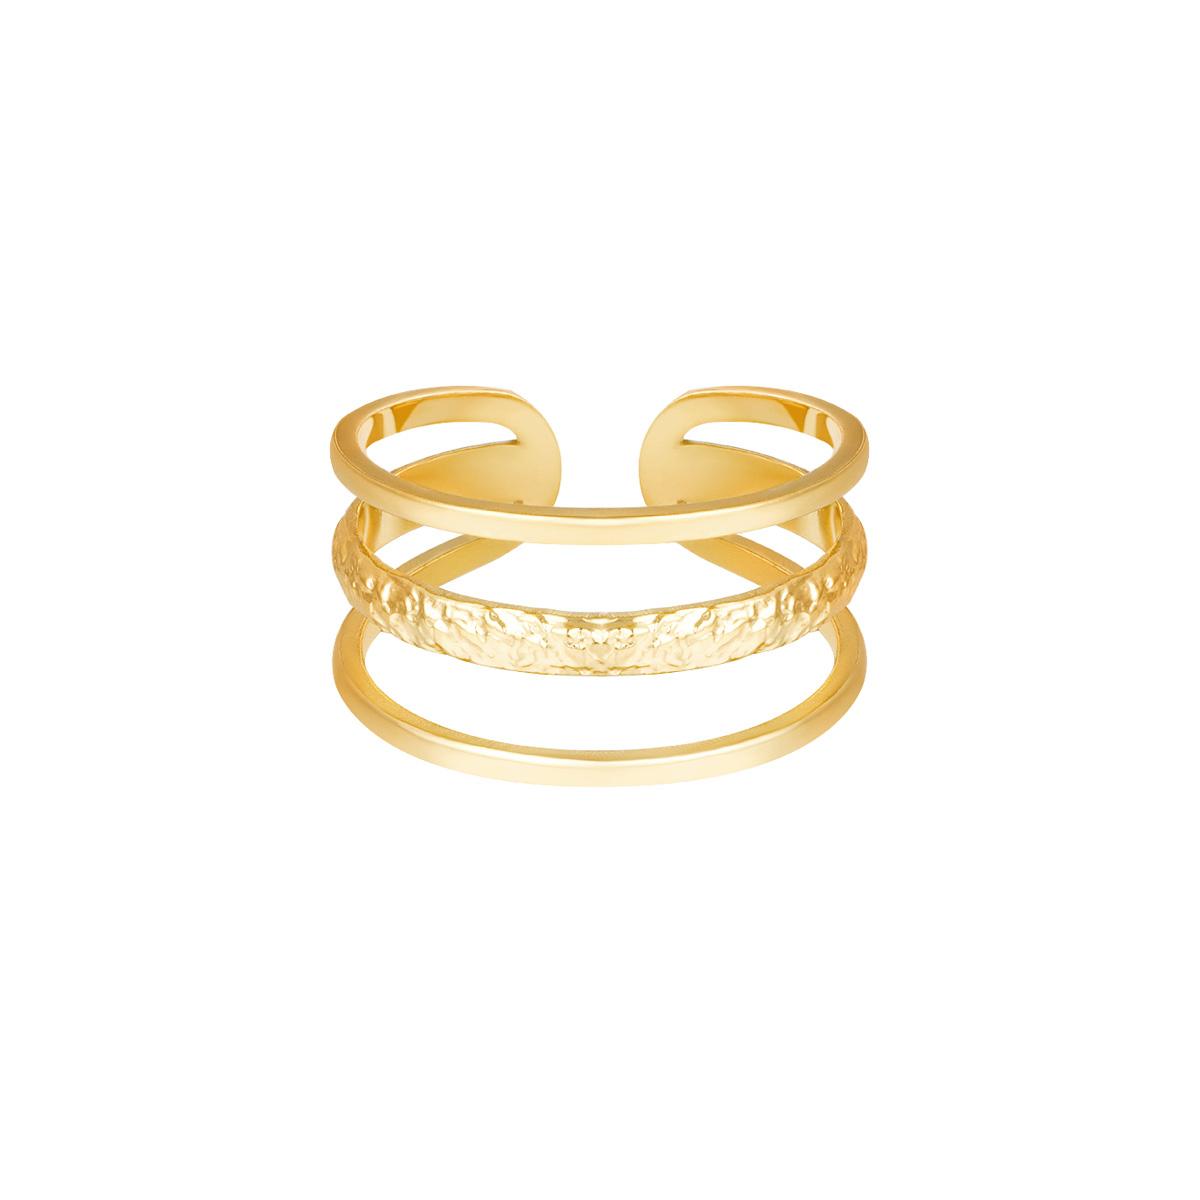 Brede Ring Layers goud gouden trendy lagen ringen dames open ringen fashion yehwang sieraden bestellen